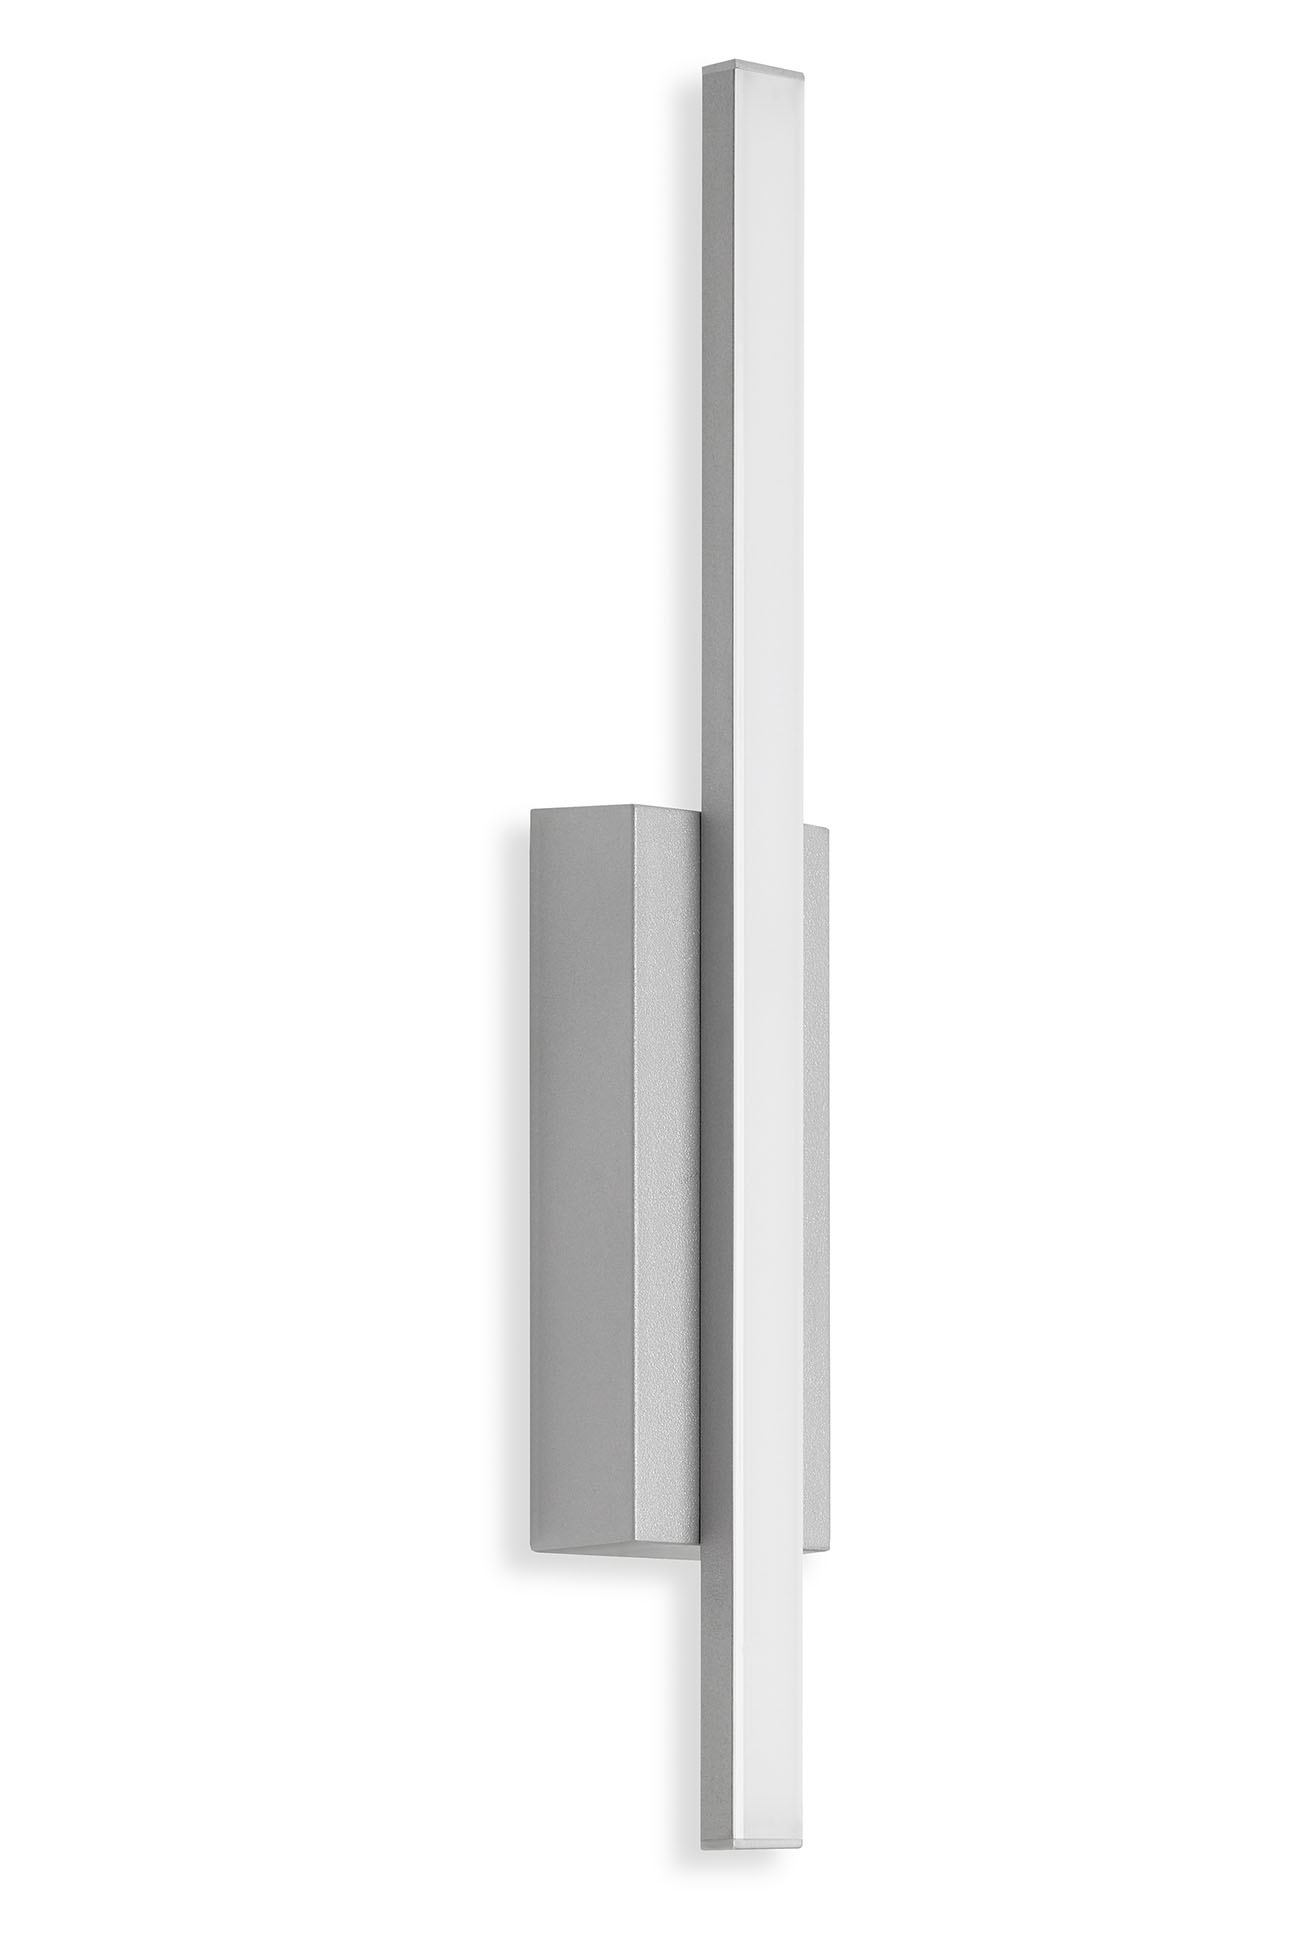 TELEFUNKEN LED Aussenwandleuchte, 37 cm, 4 W, Silber